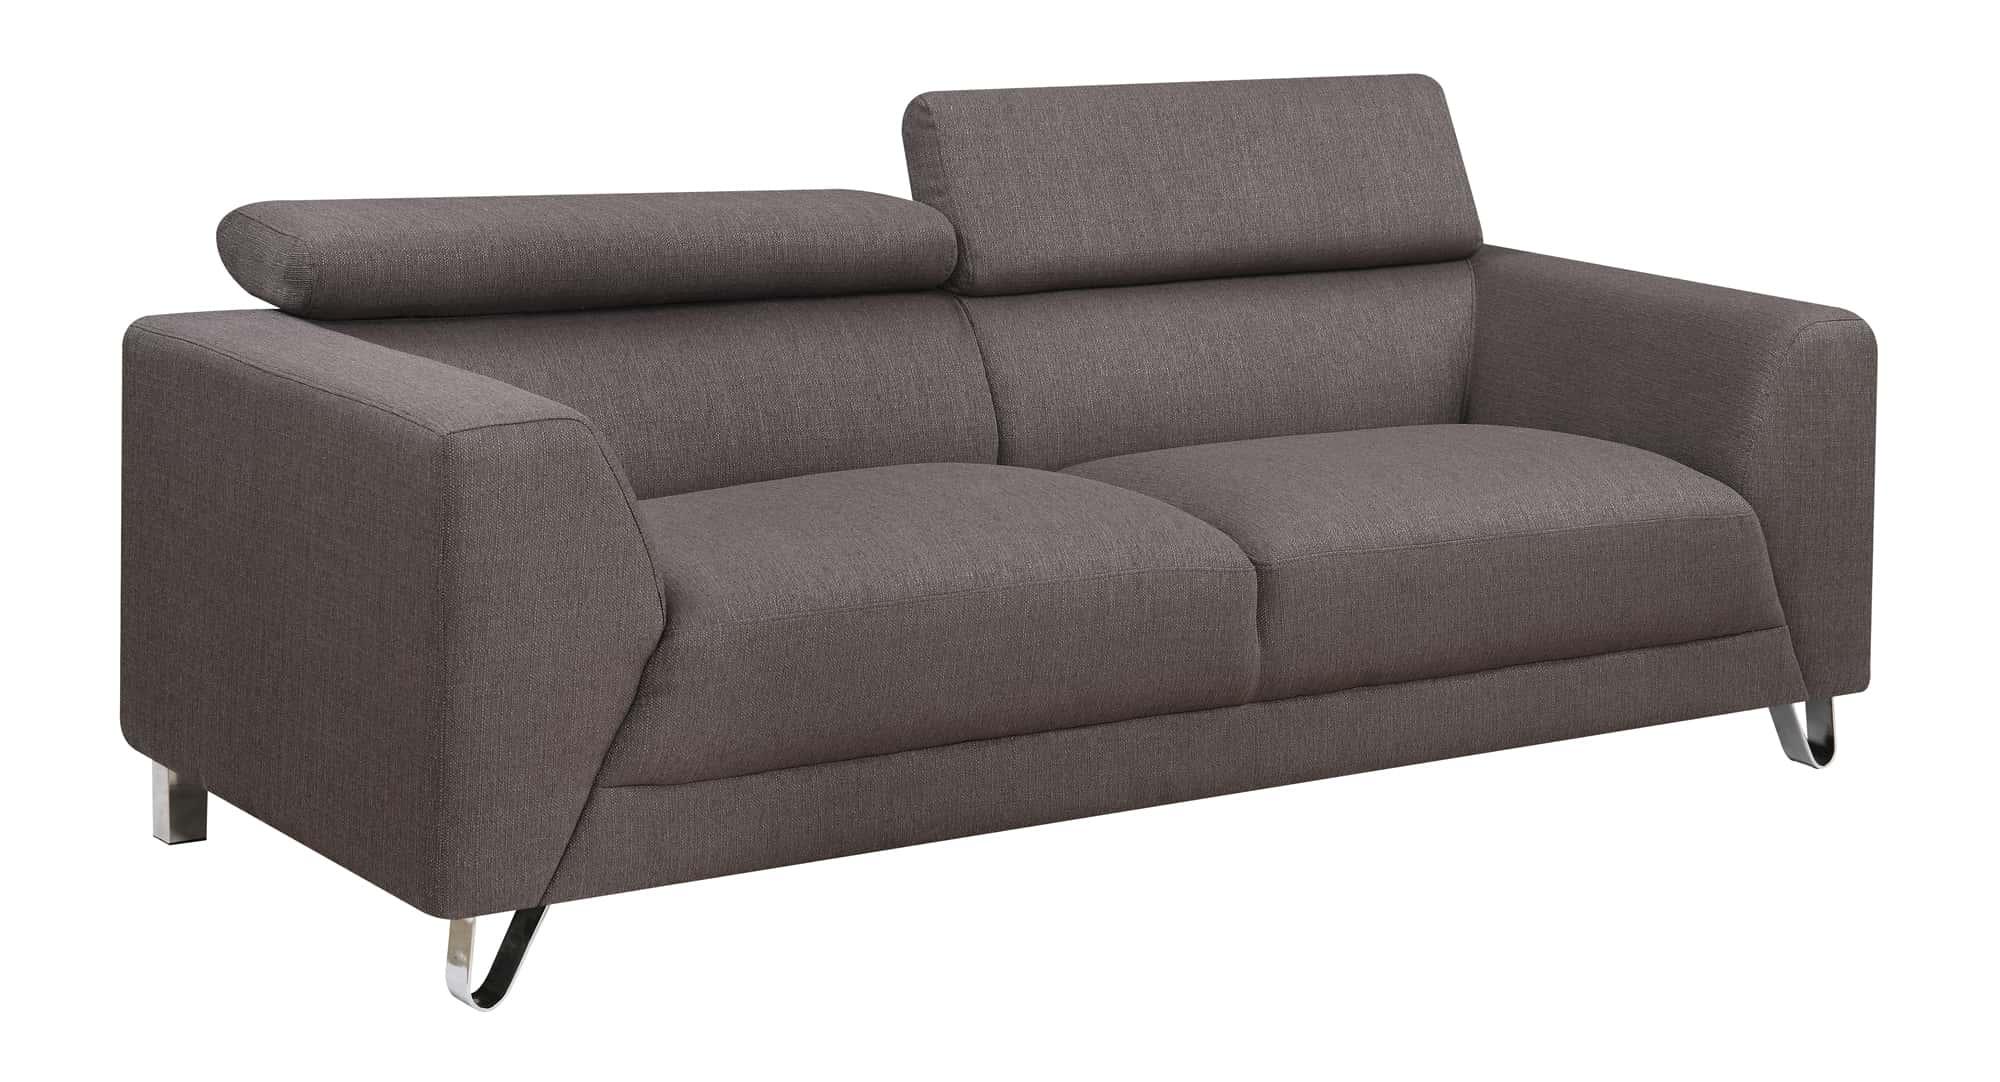 u8210 beluga fabric sofa by global furniture. Black Bedroom Furniture Sets. Home Design Ideas